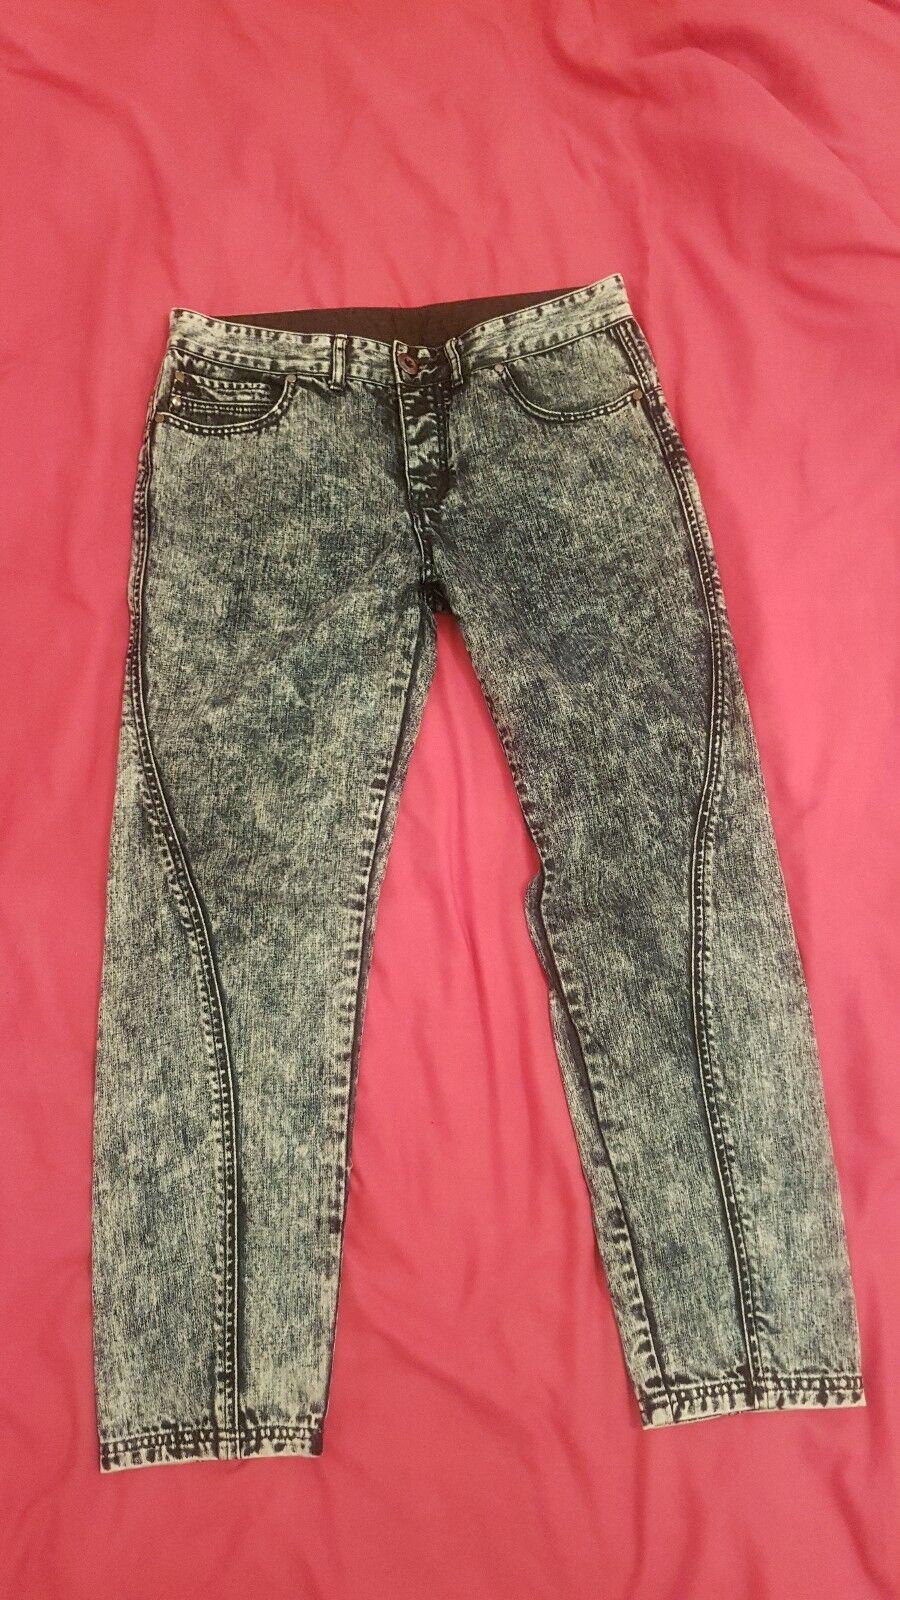 Bolongaro Trevor Ladies Boyfriend Jeans Size 12 RRP 170